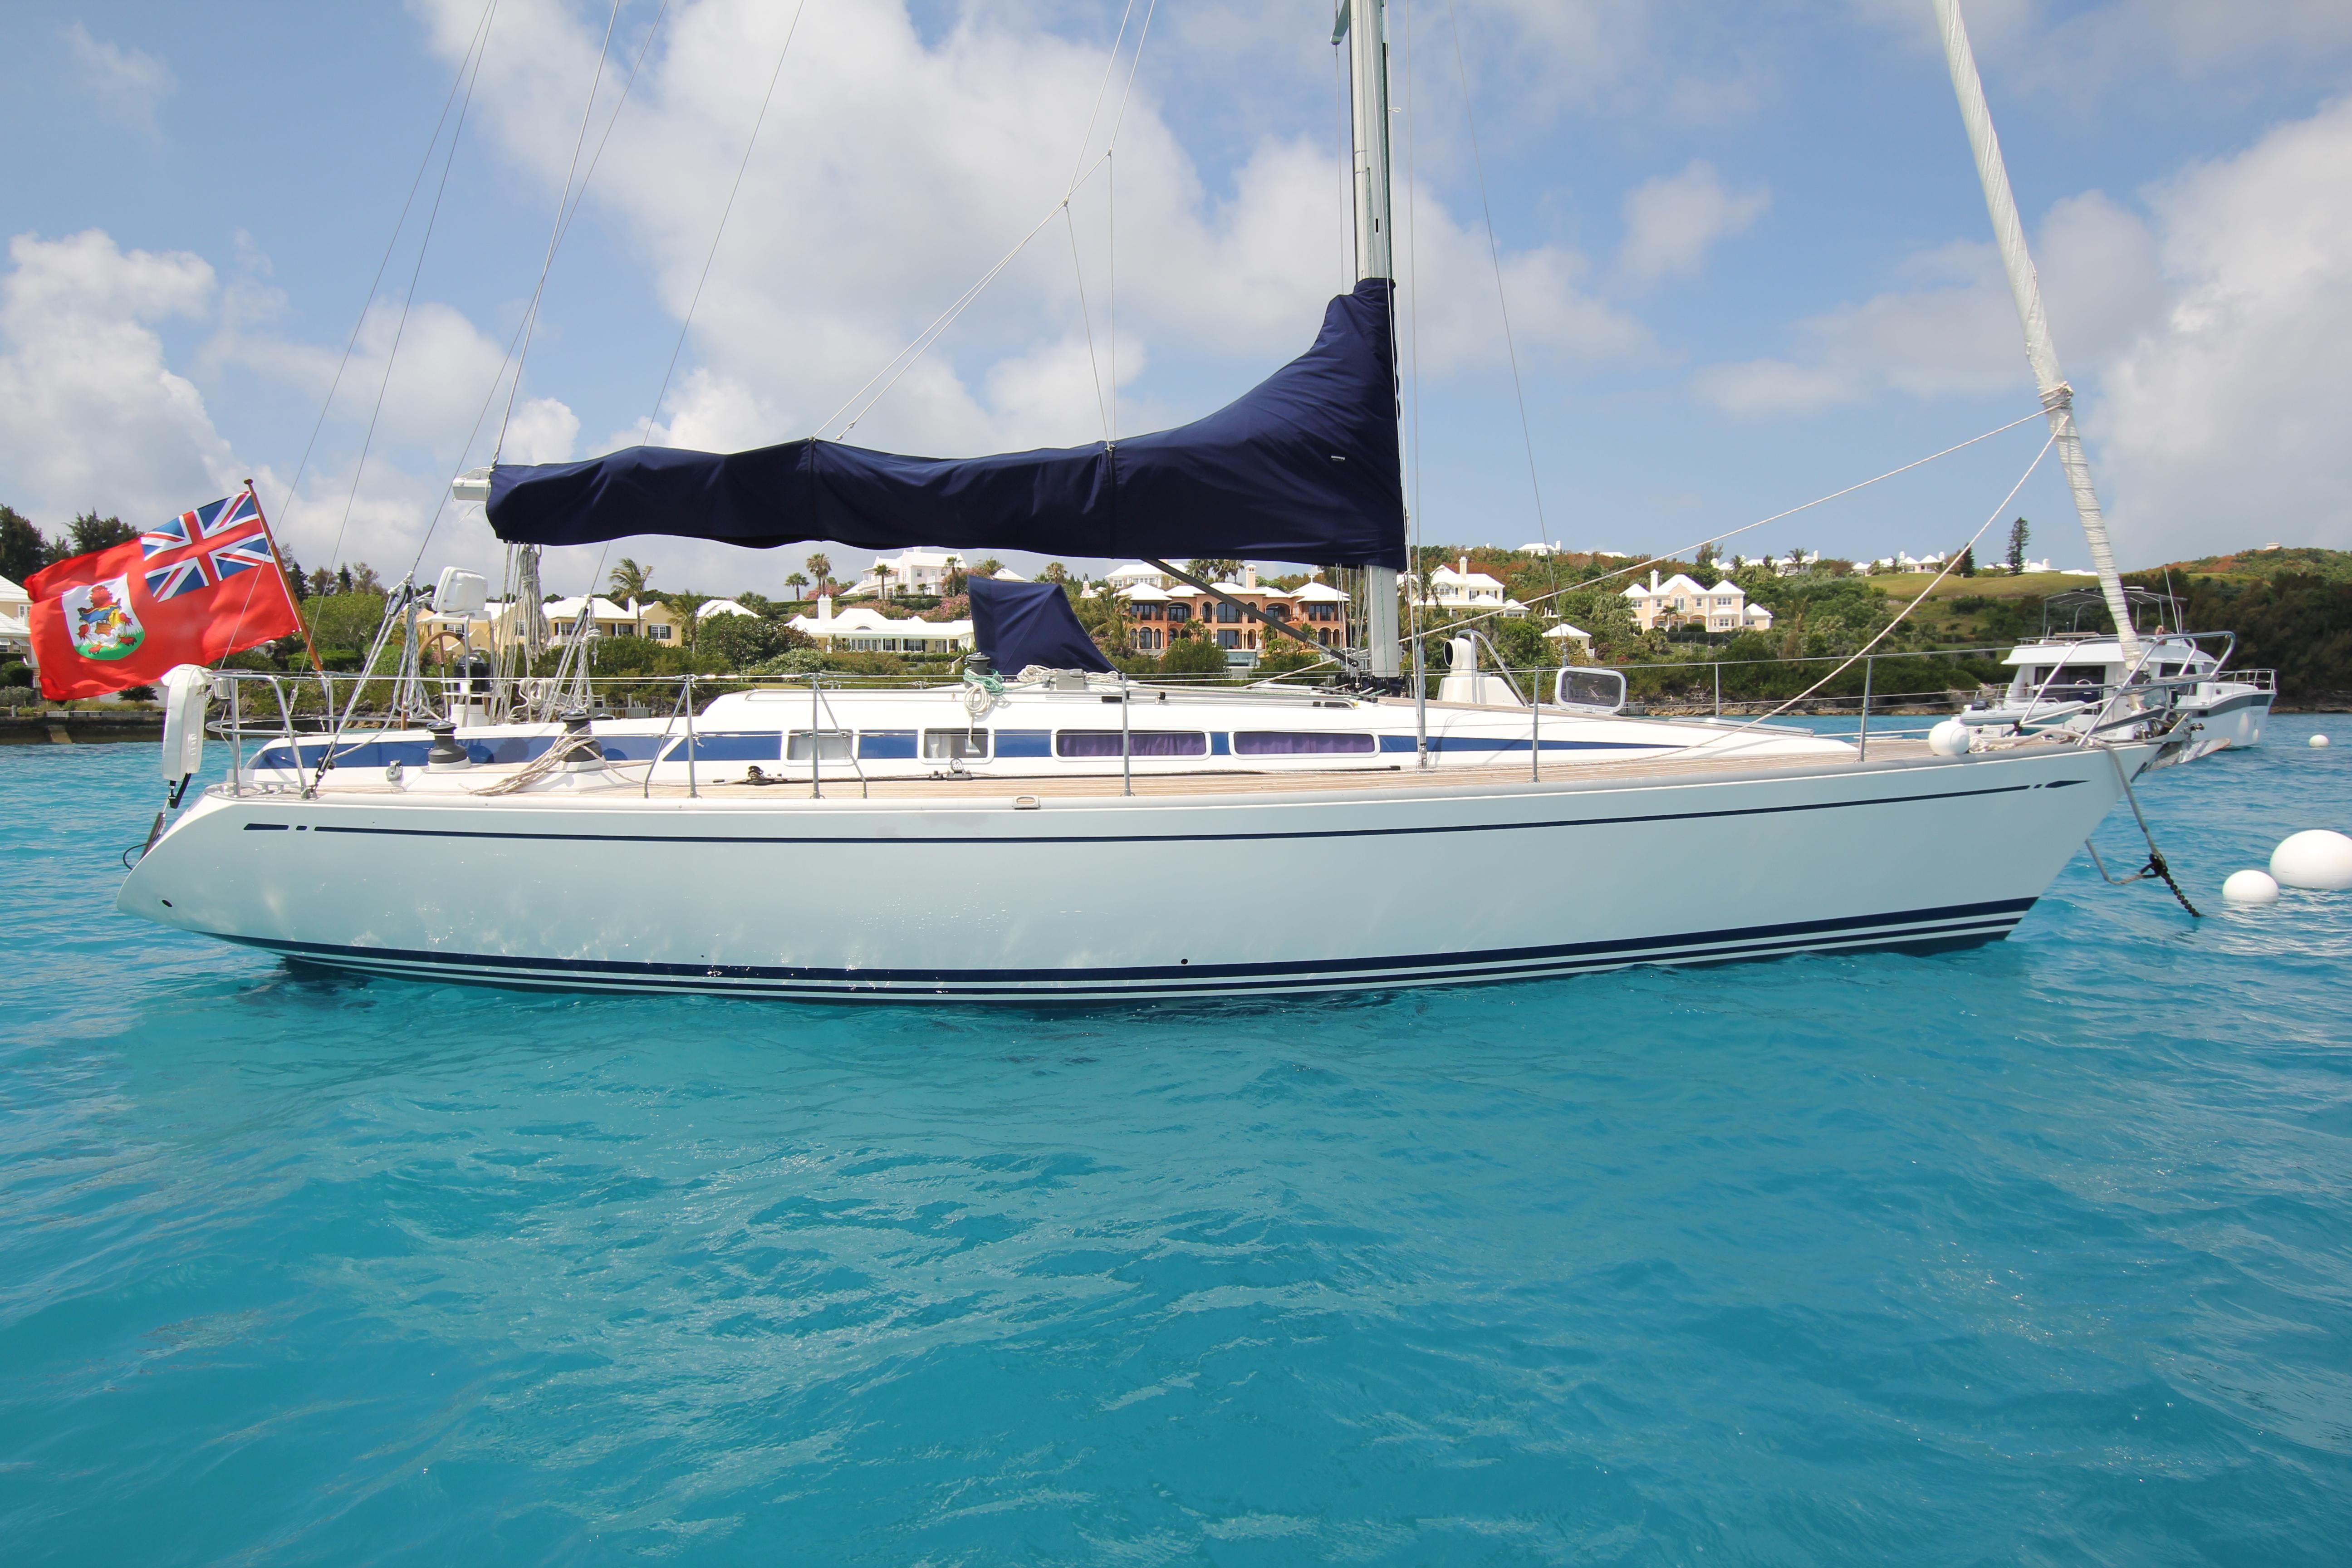 1994 Nautor Swan Swan 40 Cruiser/Racer for sale - YachtWorld